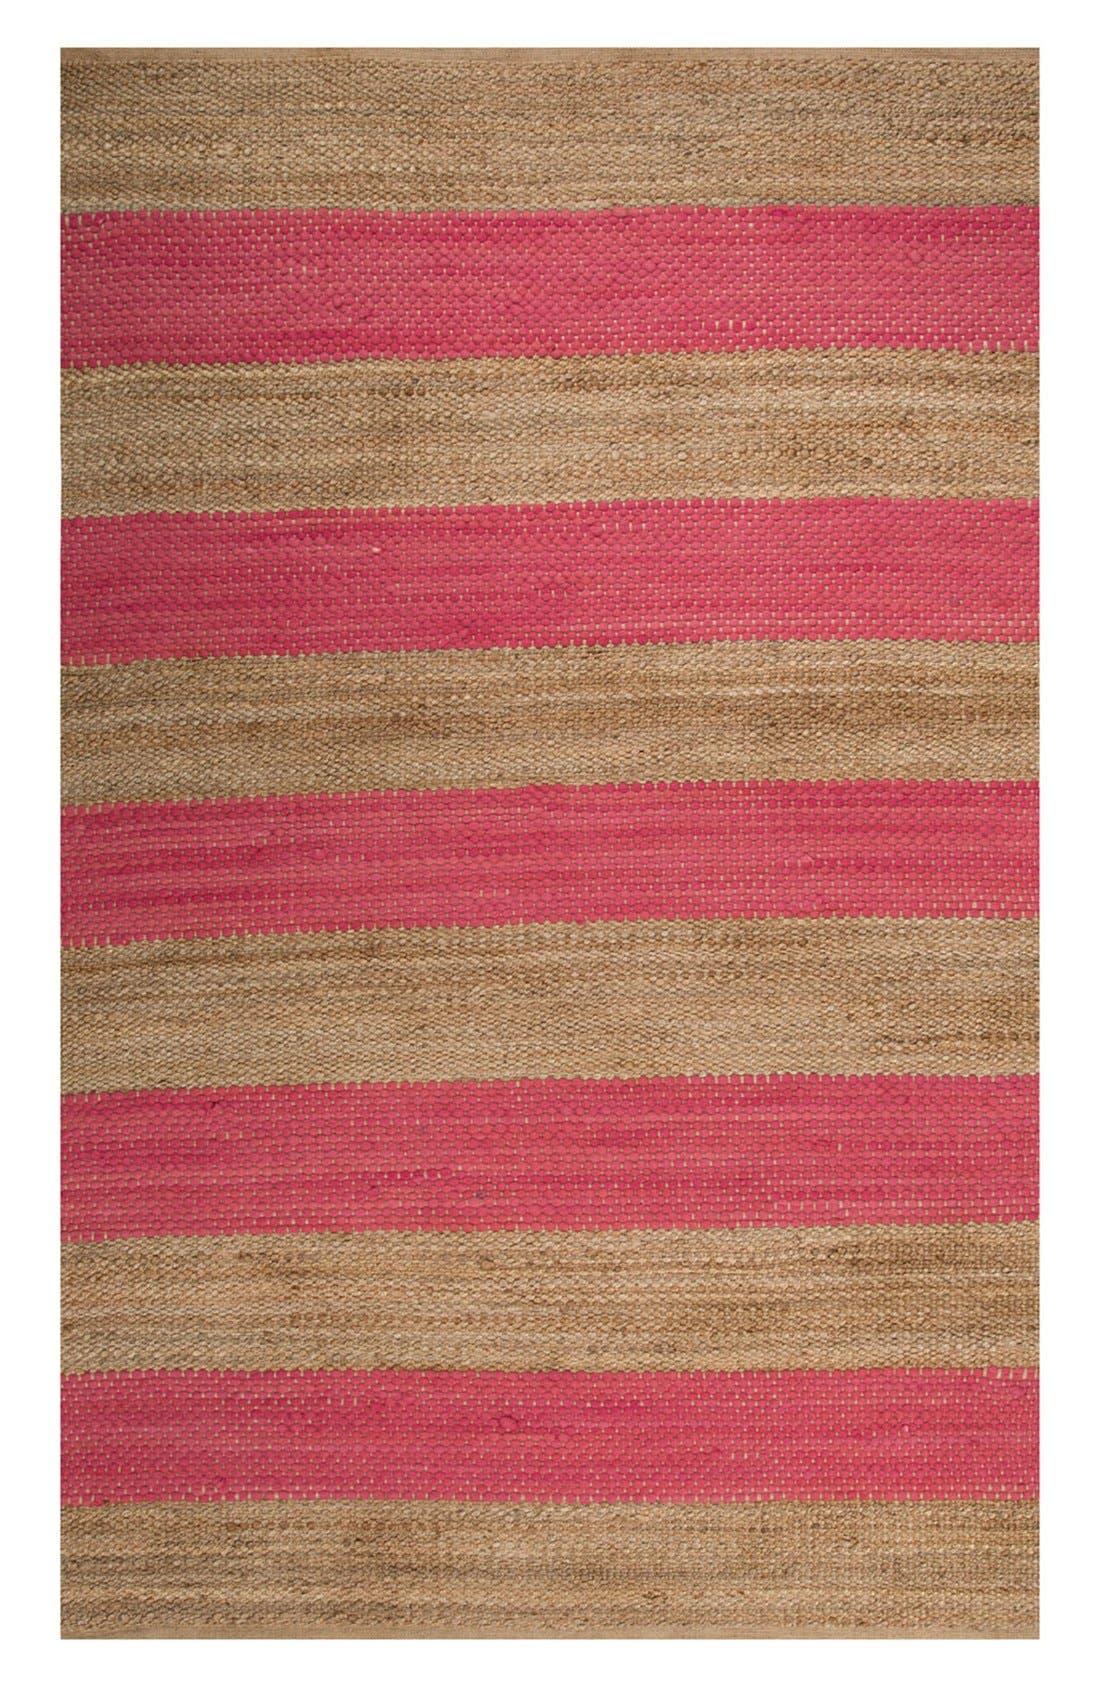 Main Image - kate spade new york 'nolita stripes' rug